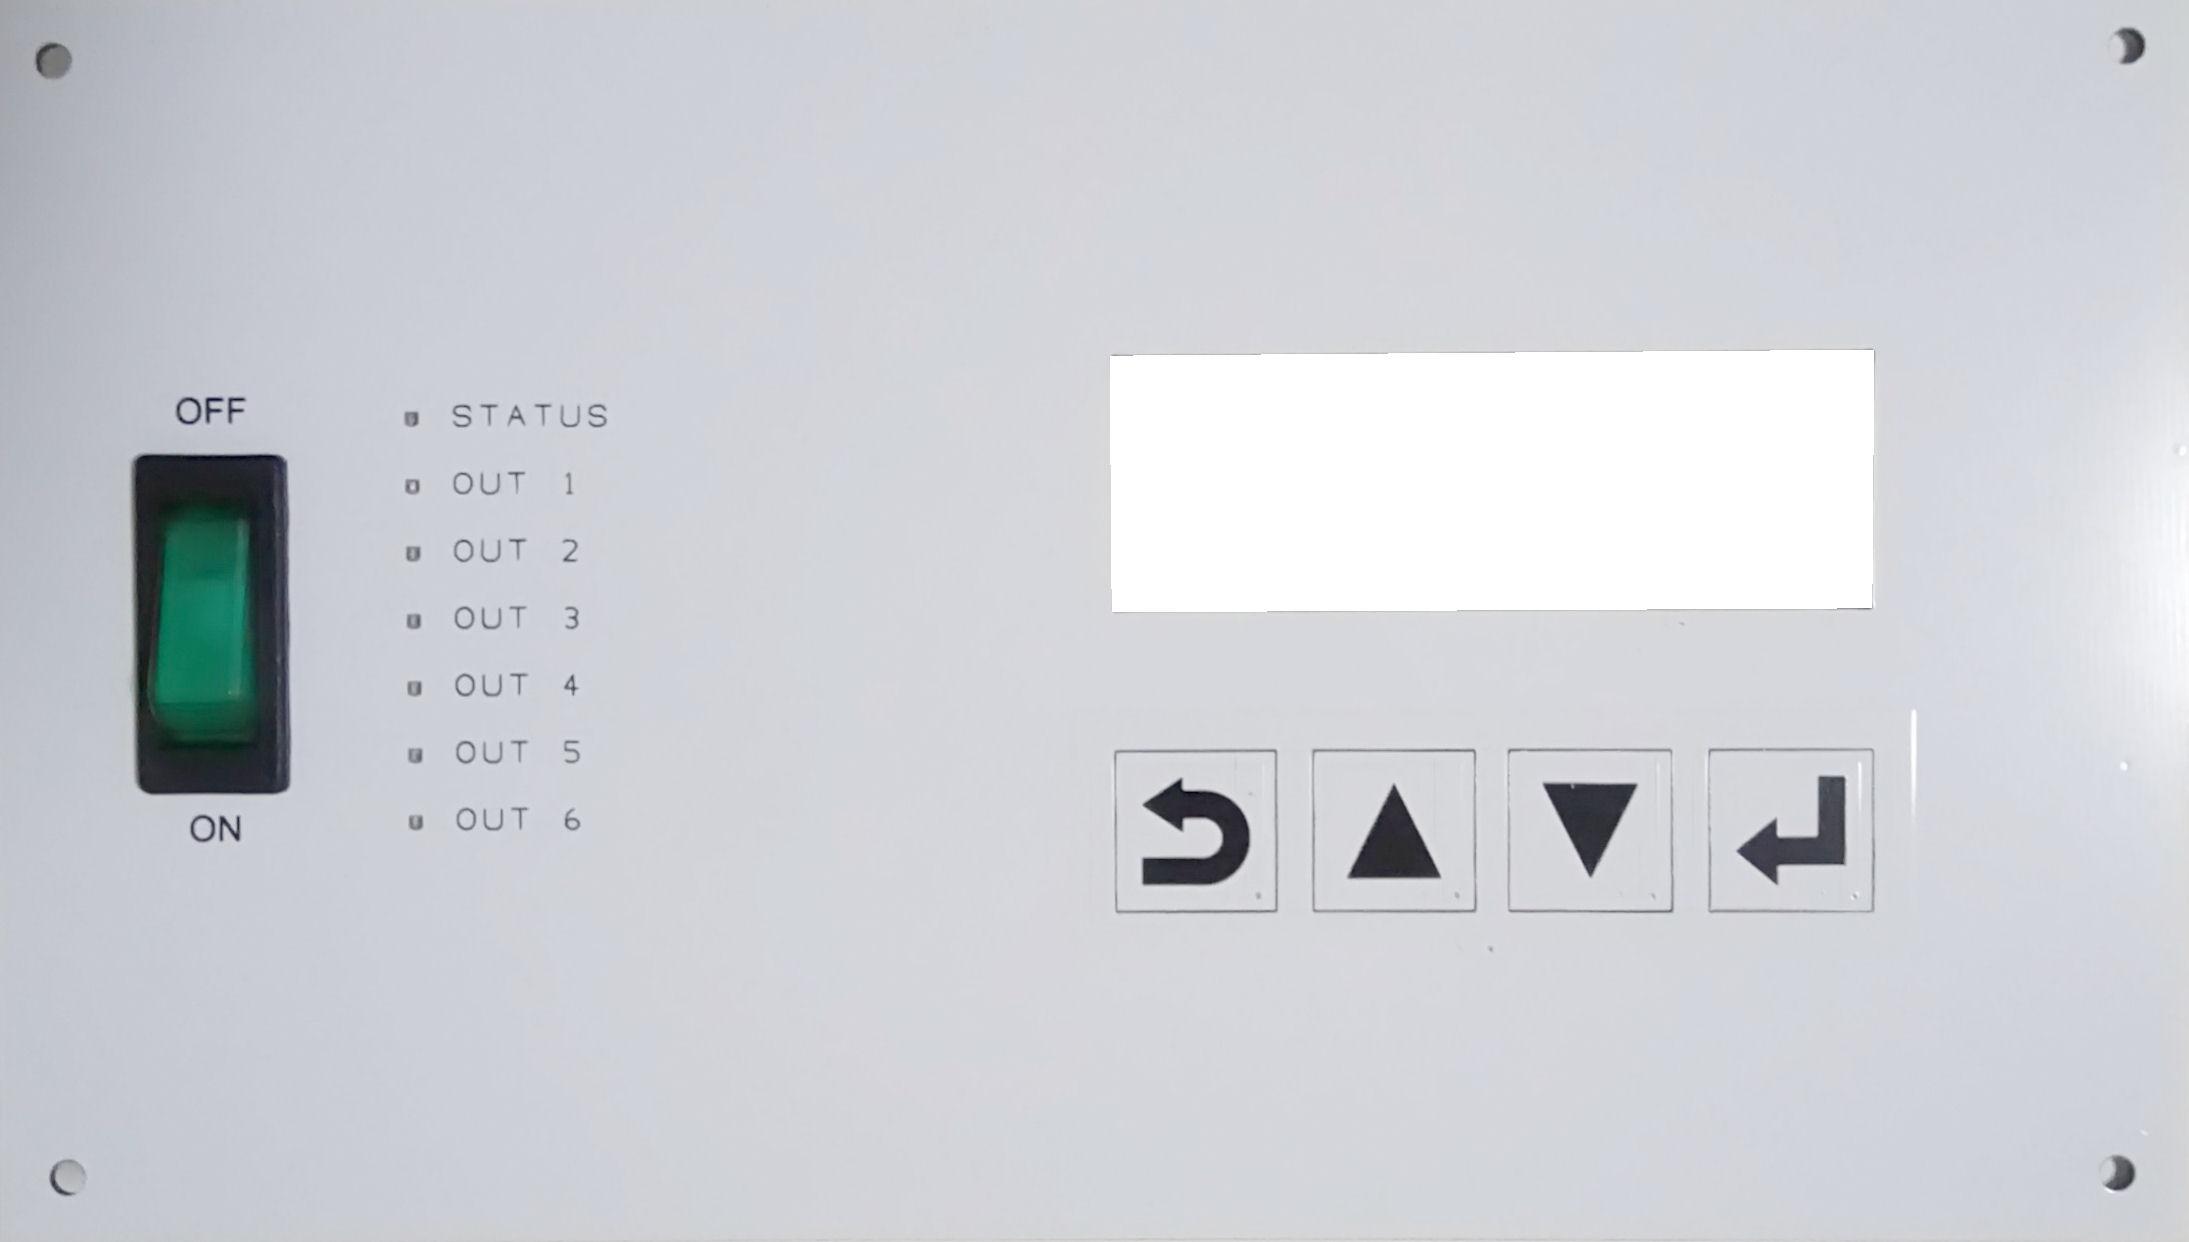 Touch panel button custom design service